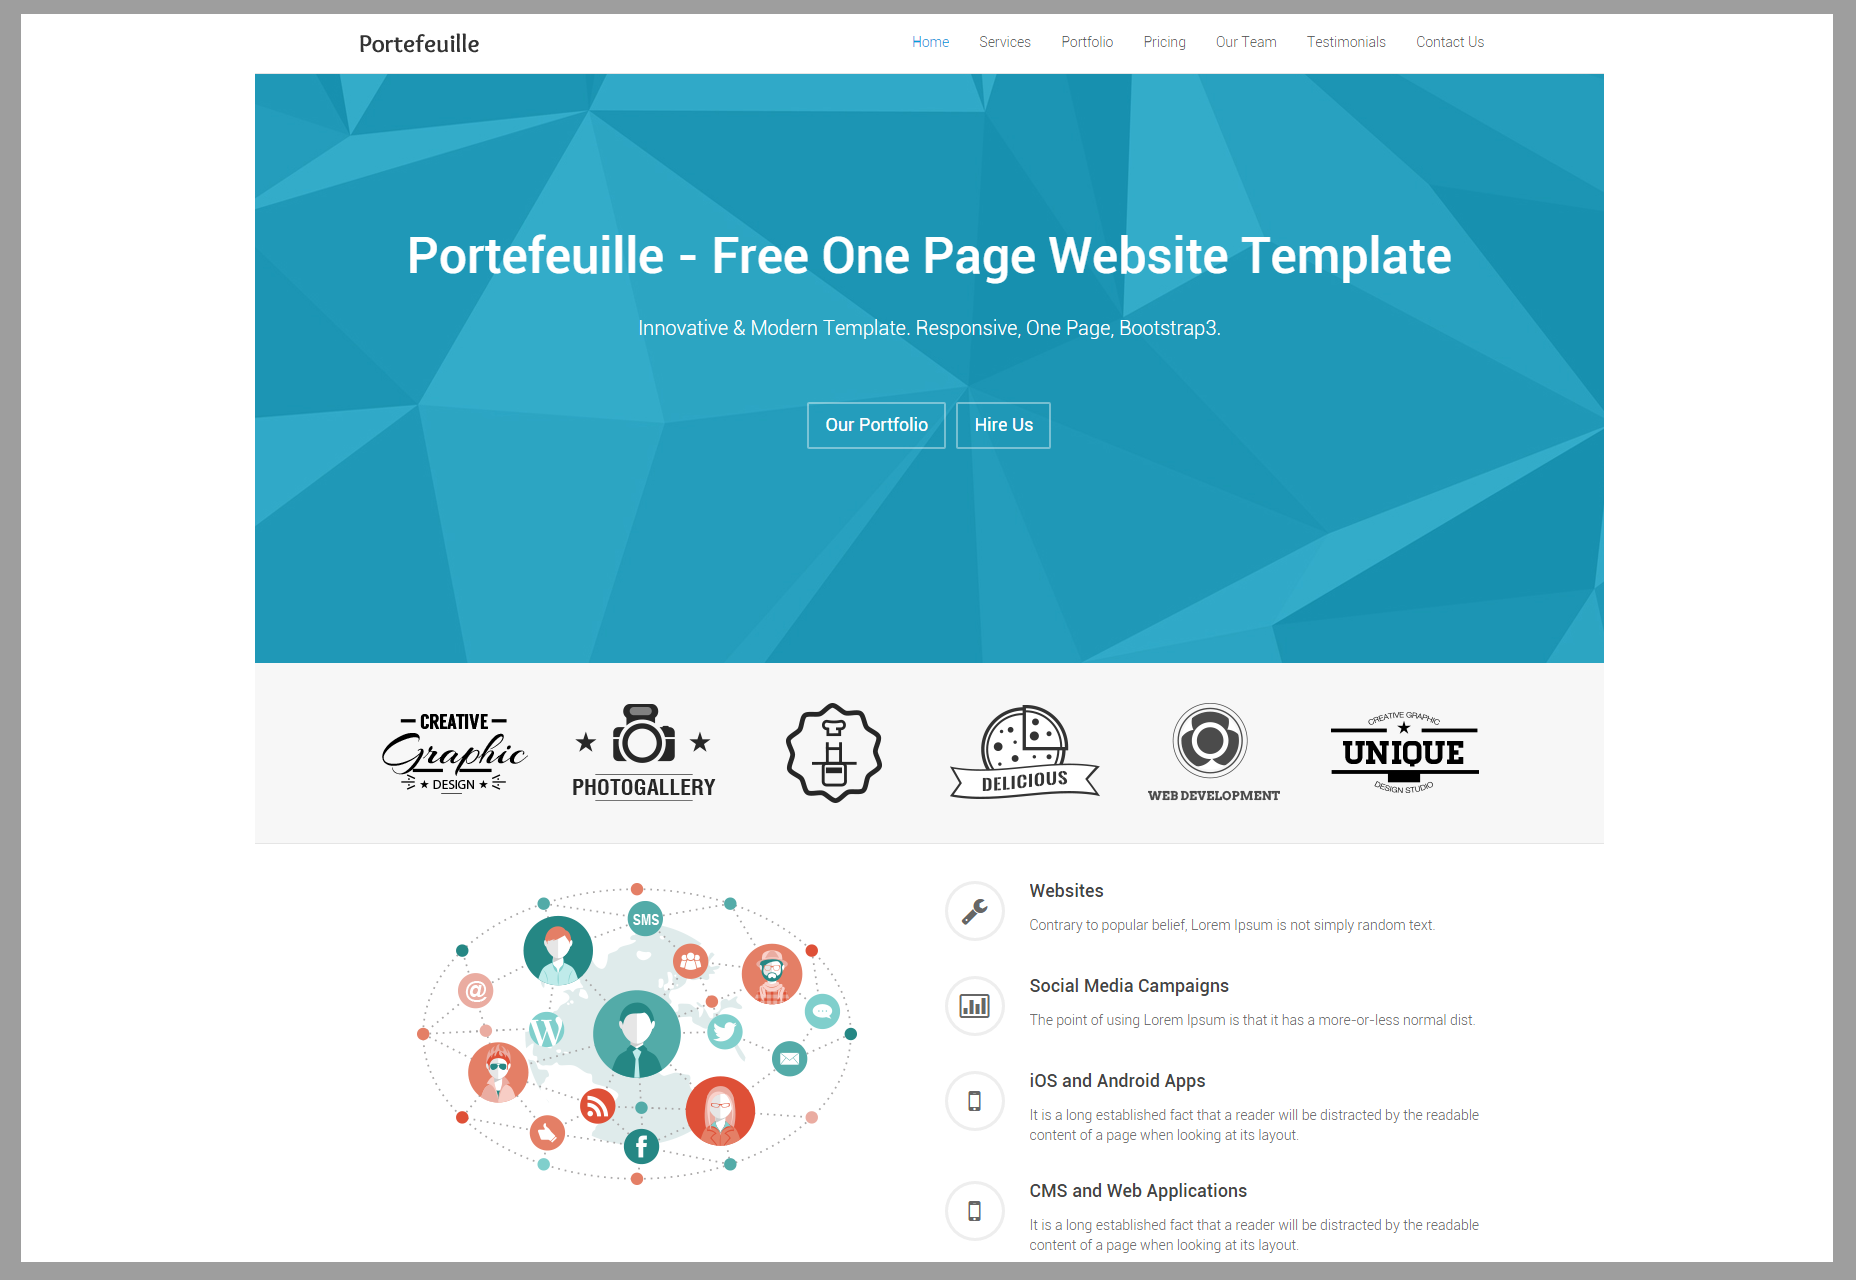 Portefeuille: HTML-thema van één pagina in portfolio